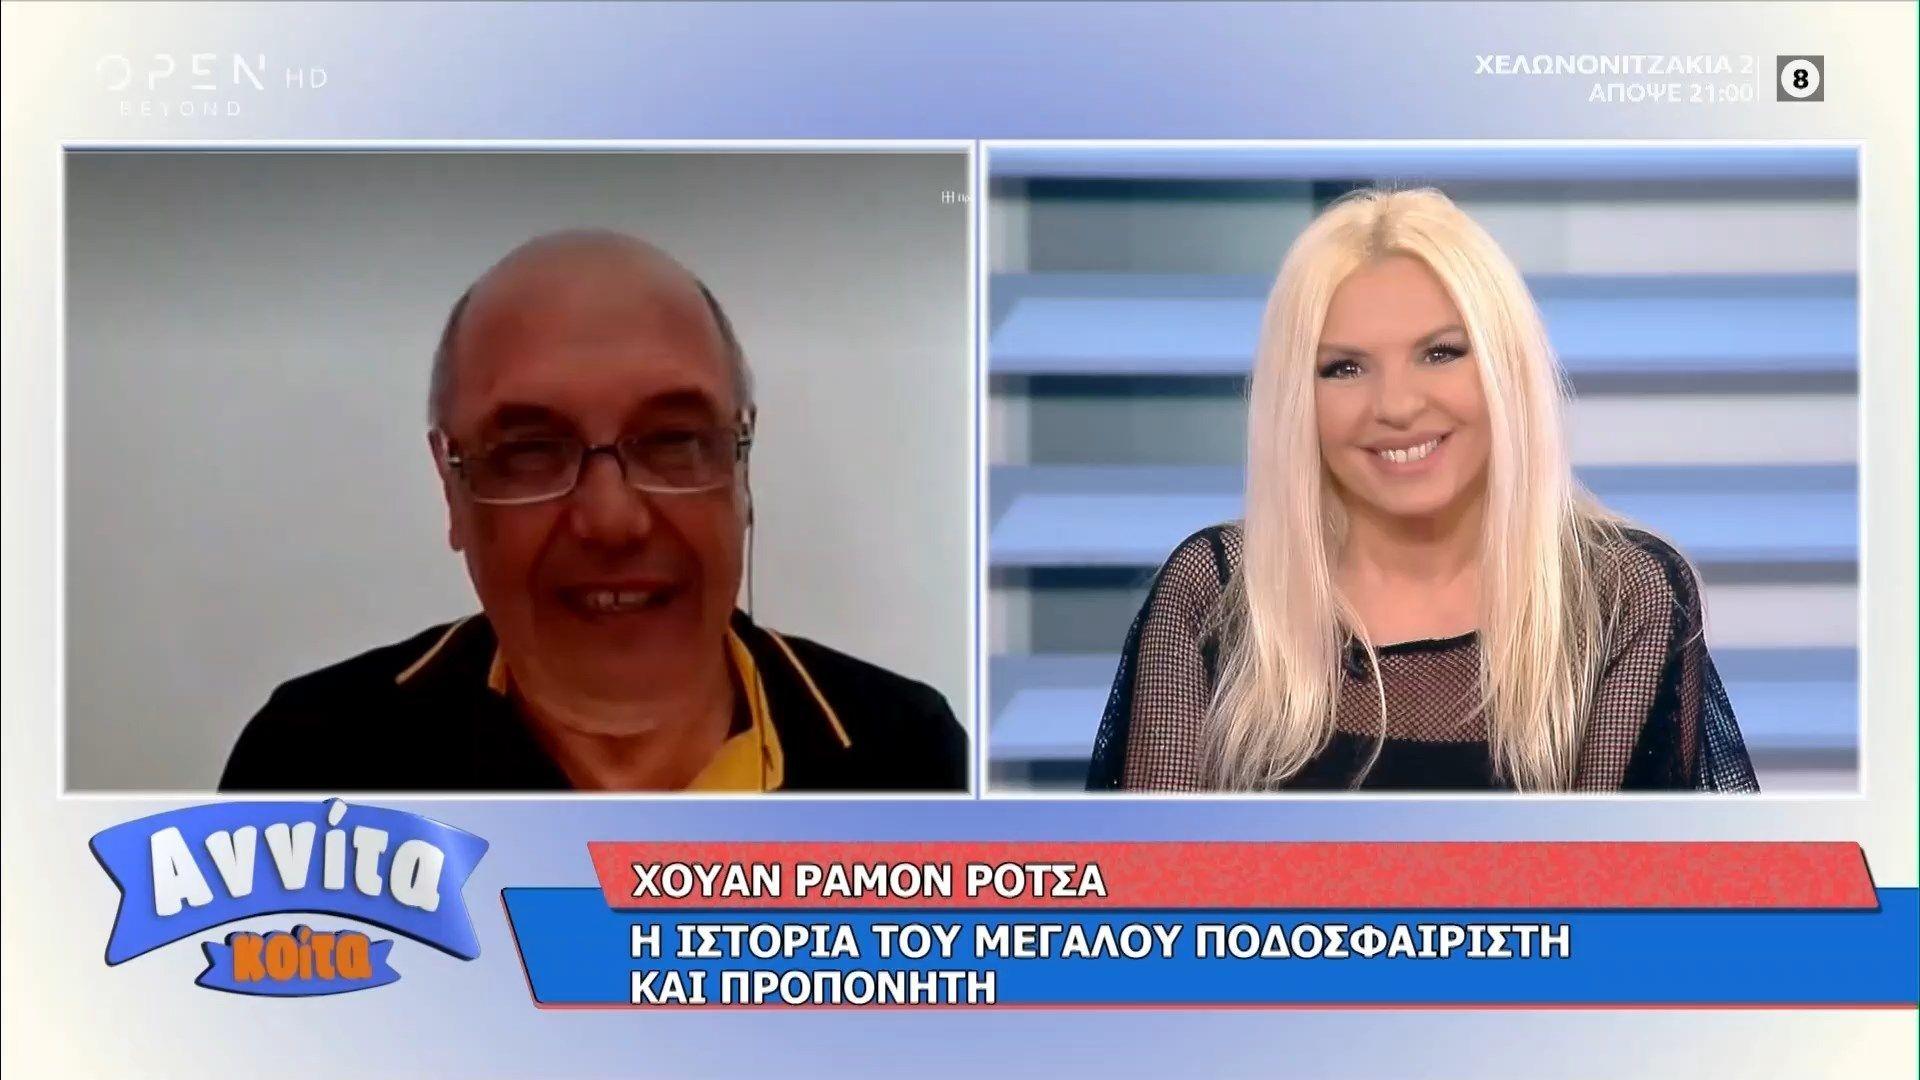 O Ρότσα μιλά στην Αννίτα για Παναθηναϊκό, Μαραντόνα, Θεσπρωτό (video)